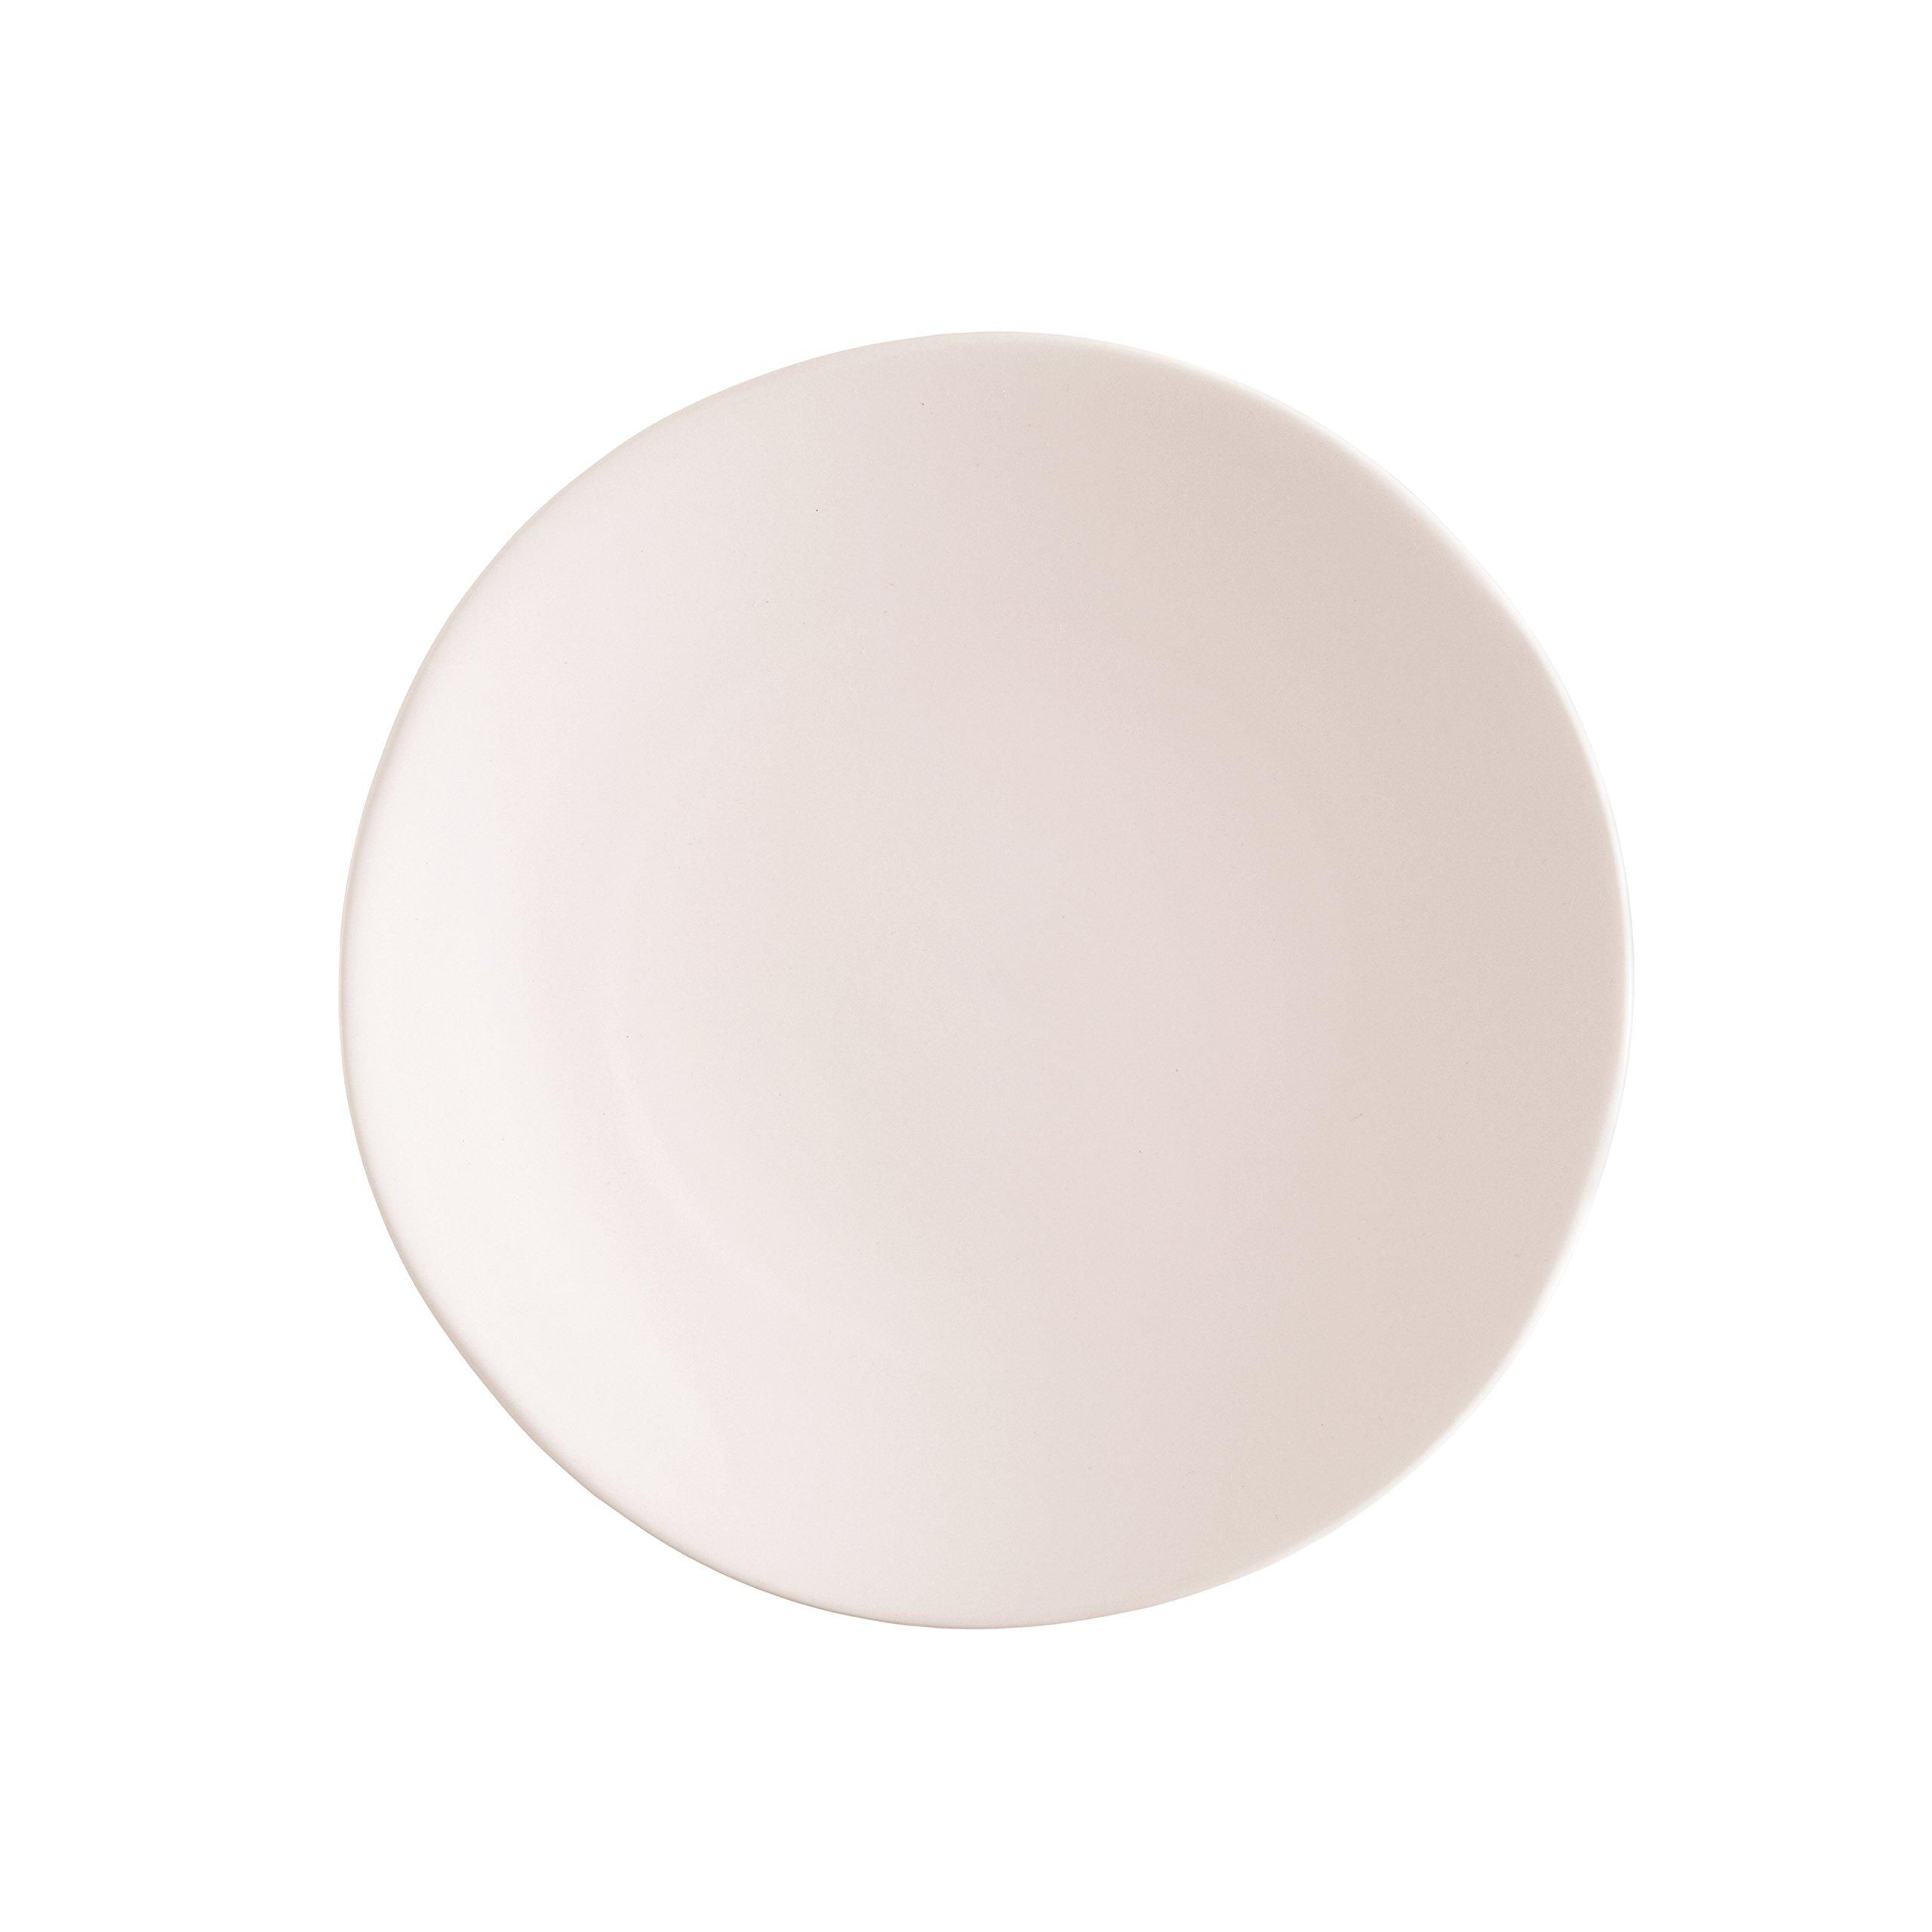 Fortessa Vitraluxe Dinnerware Heirloom Matte Finish Show Plate 12-Inch, Blush, Set of 4